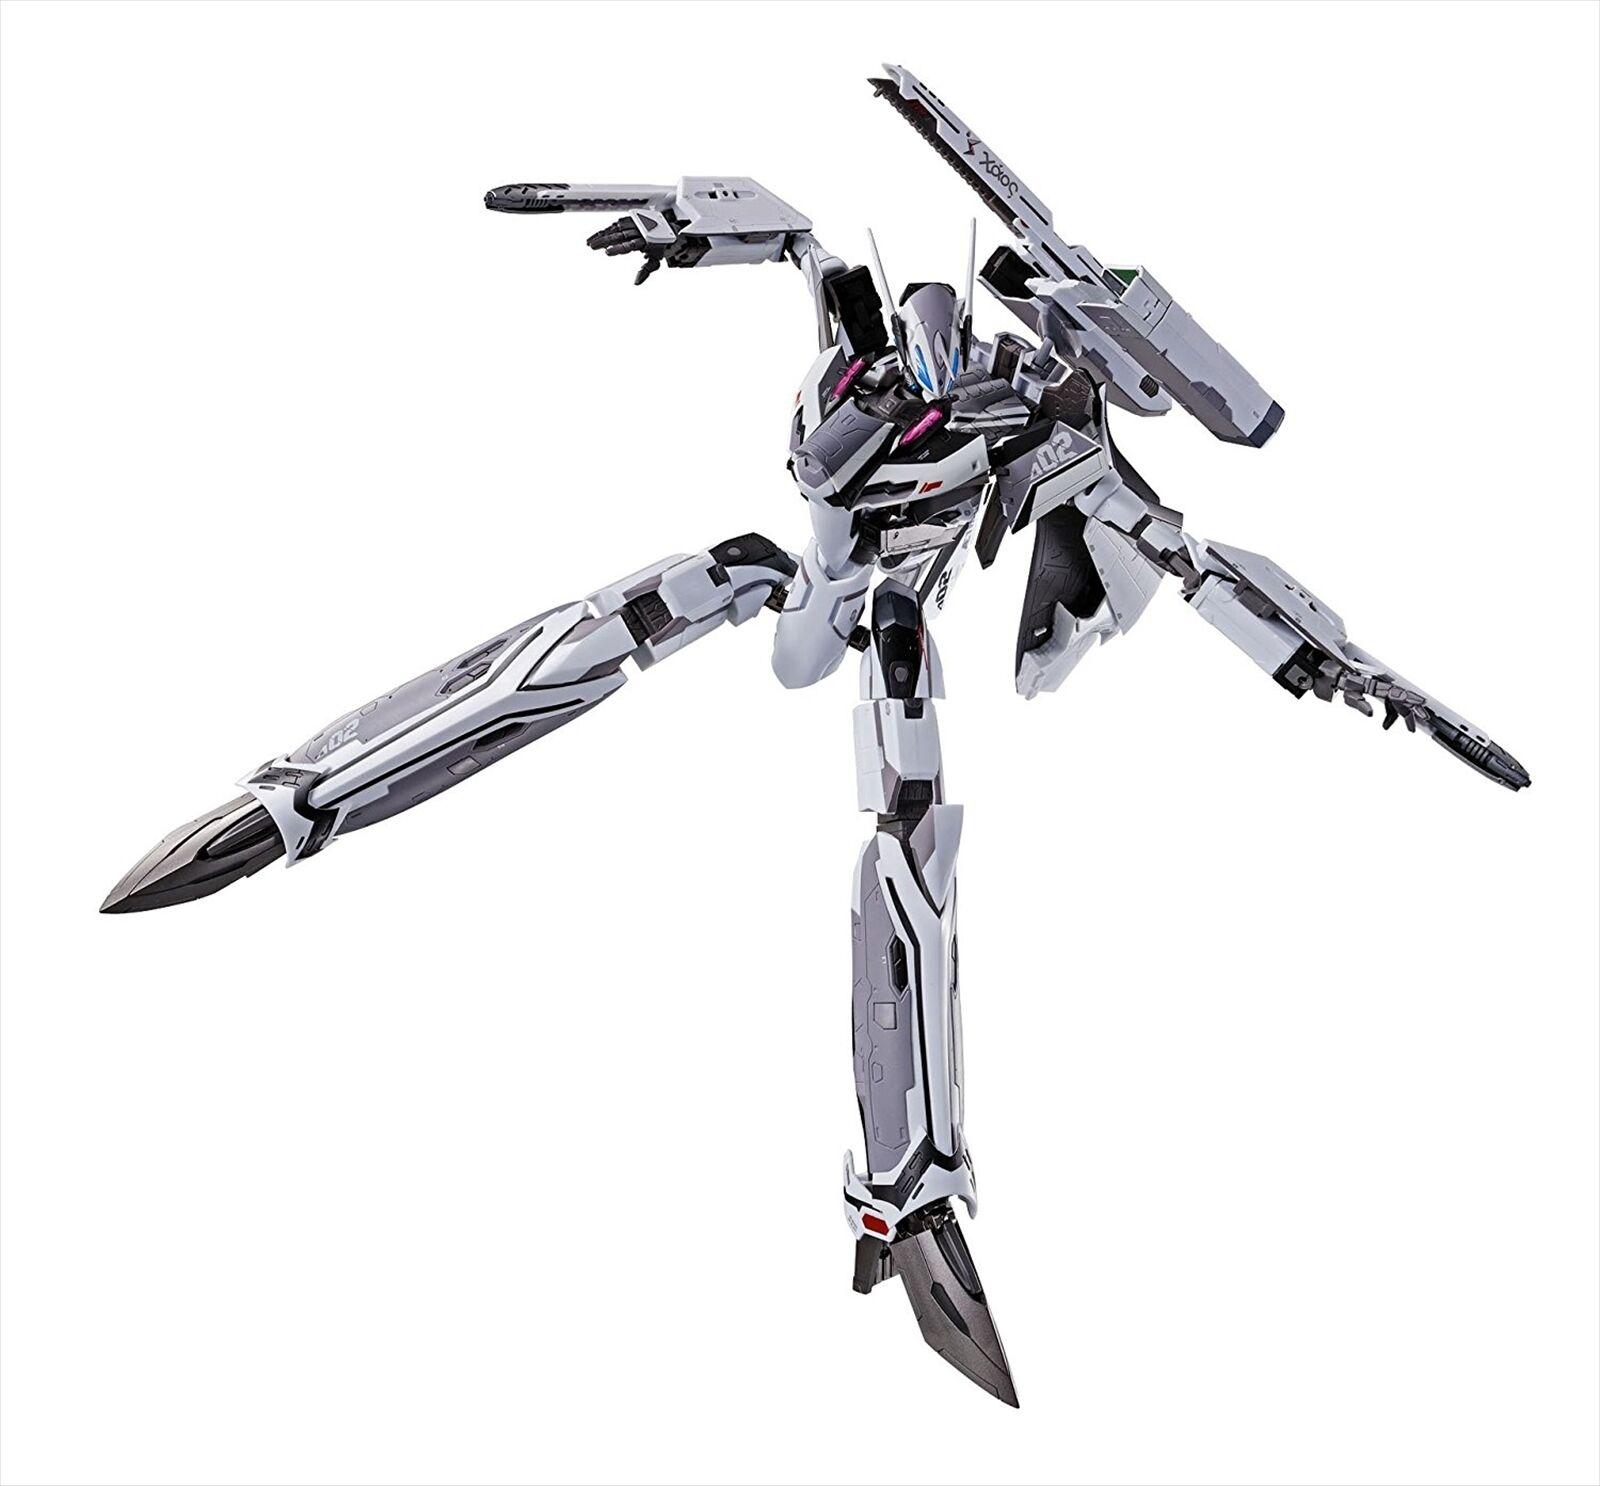 Bandai Dx Chogokin Macross Delta VF-31F MESSER Siegfried Figura De Acción